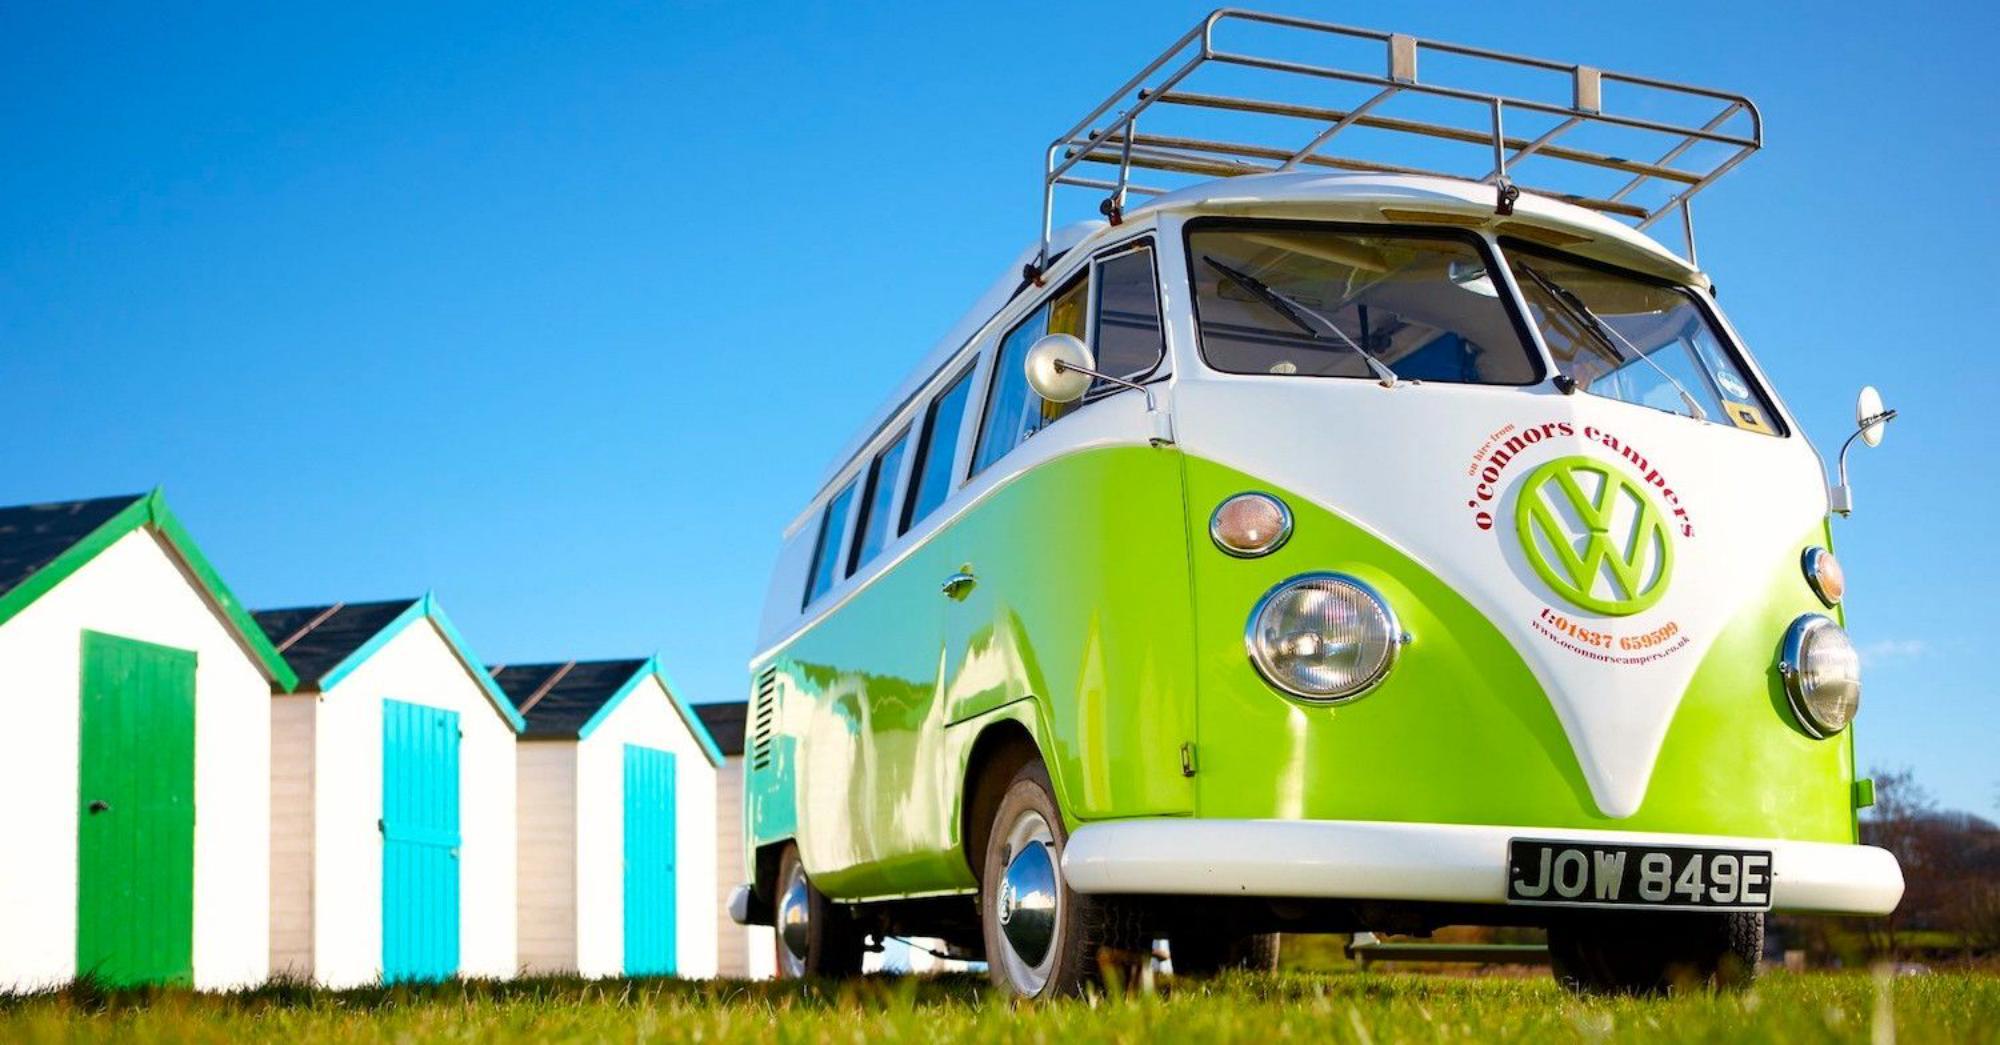 Campervan Hire in Okehampton | Motorhome Rental in Okehampton